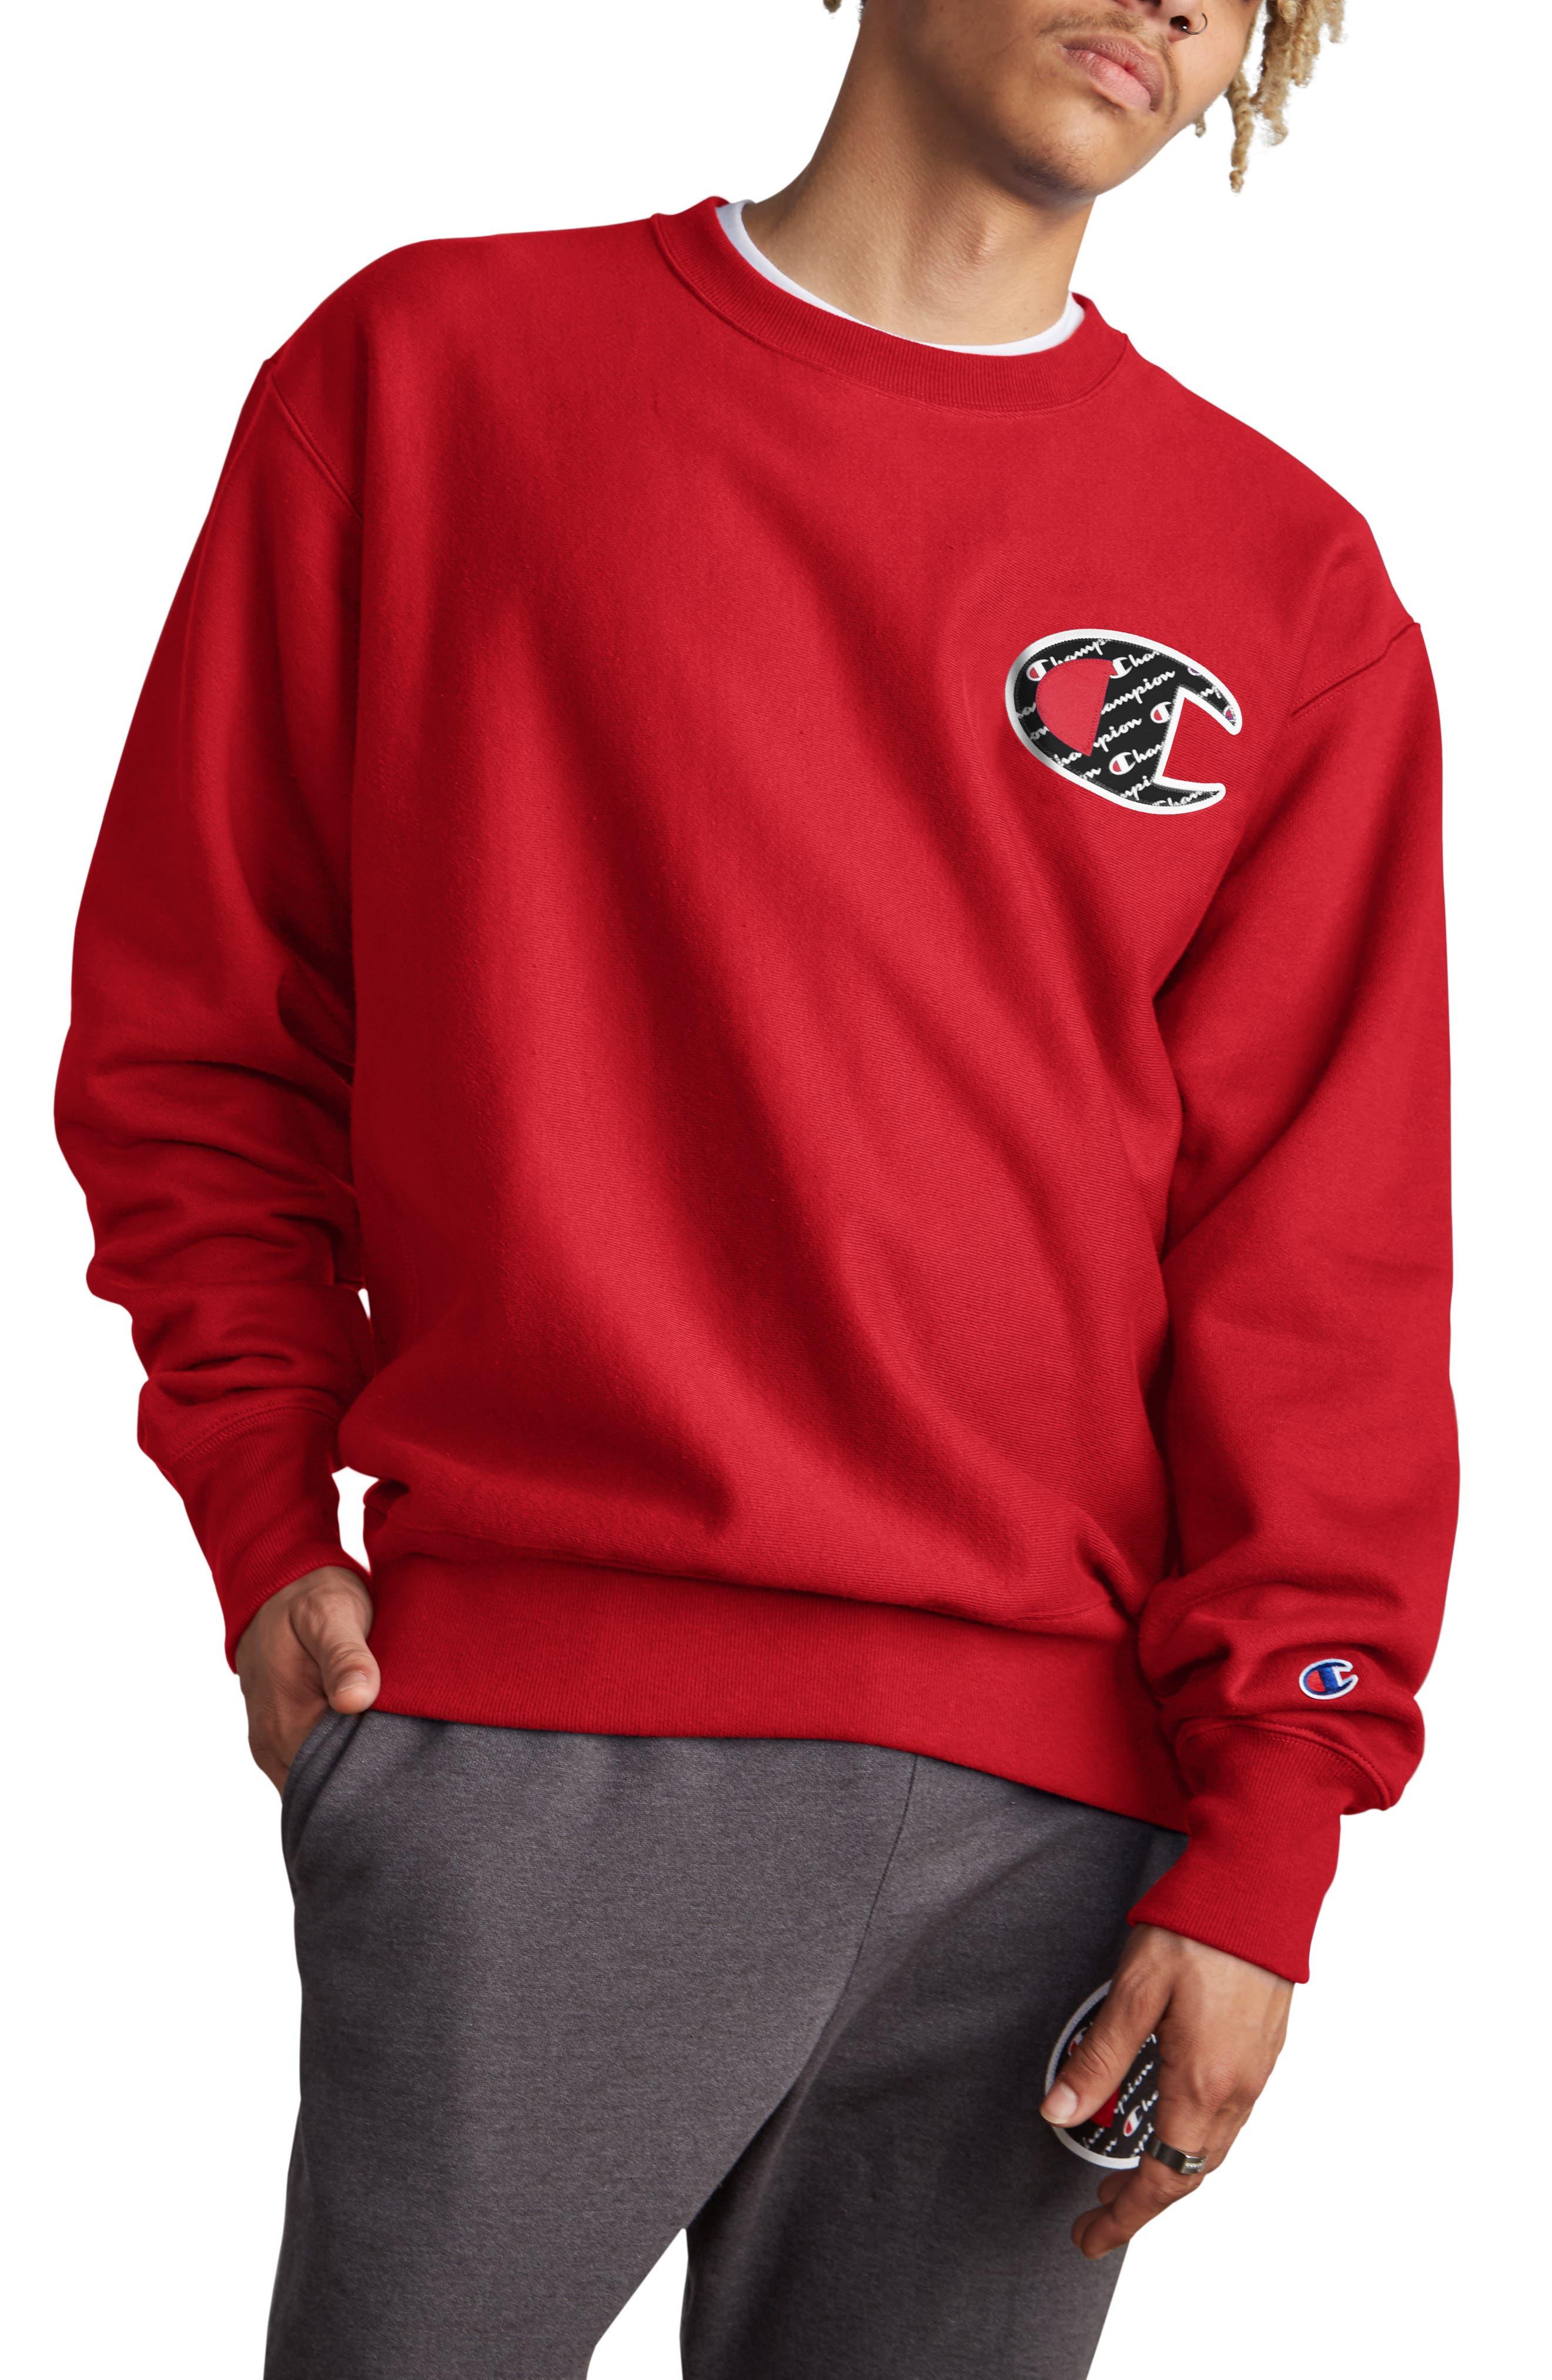 Sublimated Logo Crewneck Sweatshirt,                             Main thumbnail 1, color,                             TEAM RED SCARLET